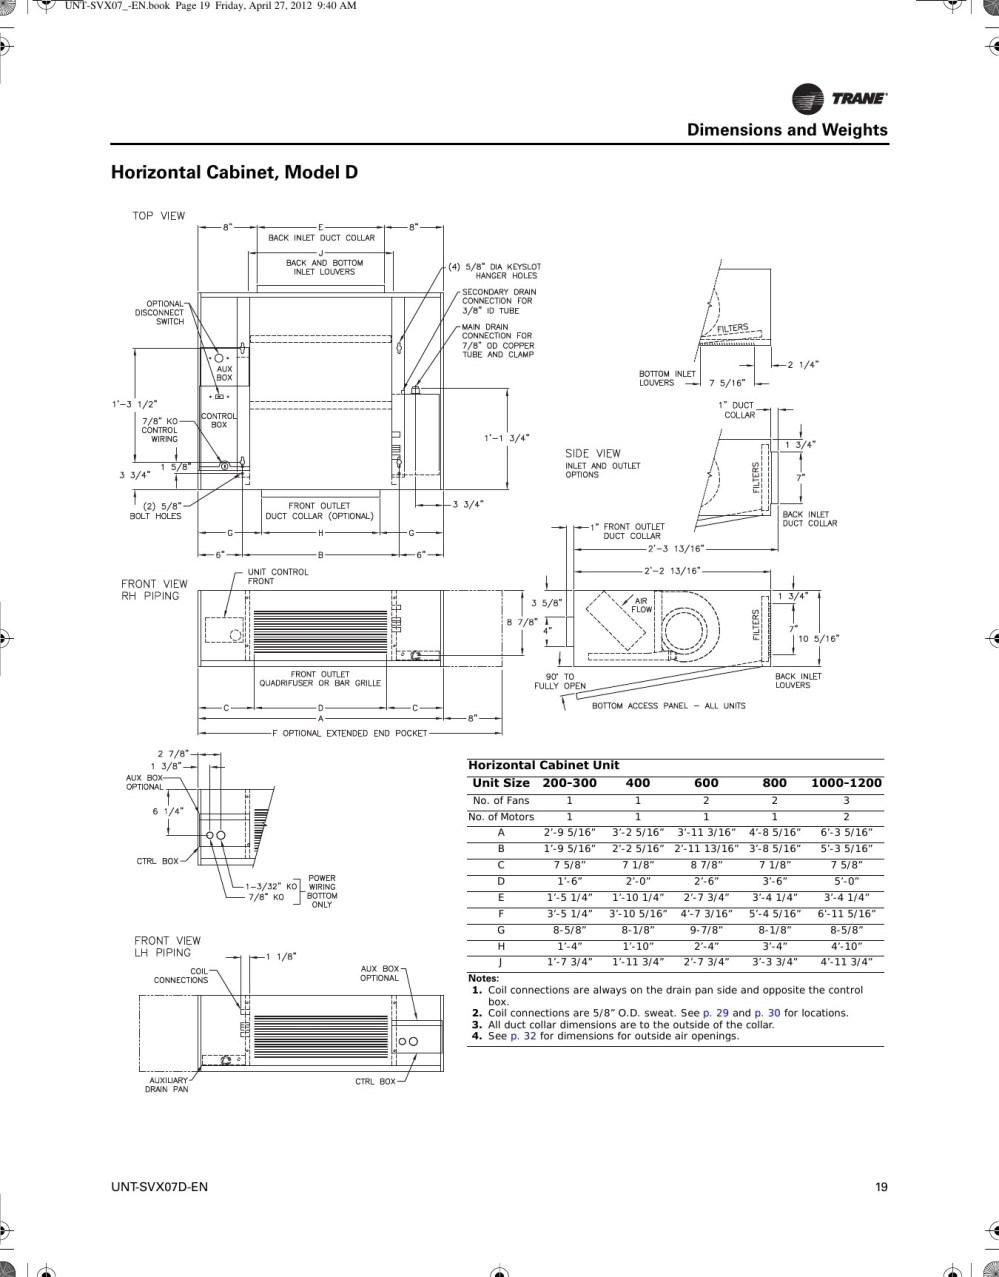 medium resolution of hid rp40 wiring diagram trane wsc060 wiring diagram download trane wiring diagrams fresh trane heat